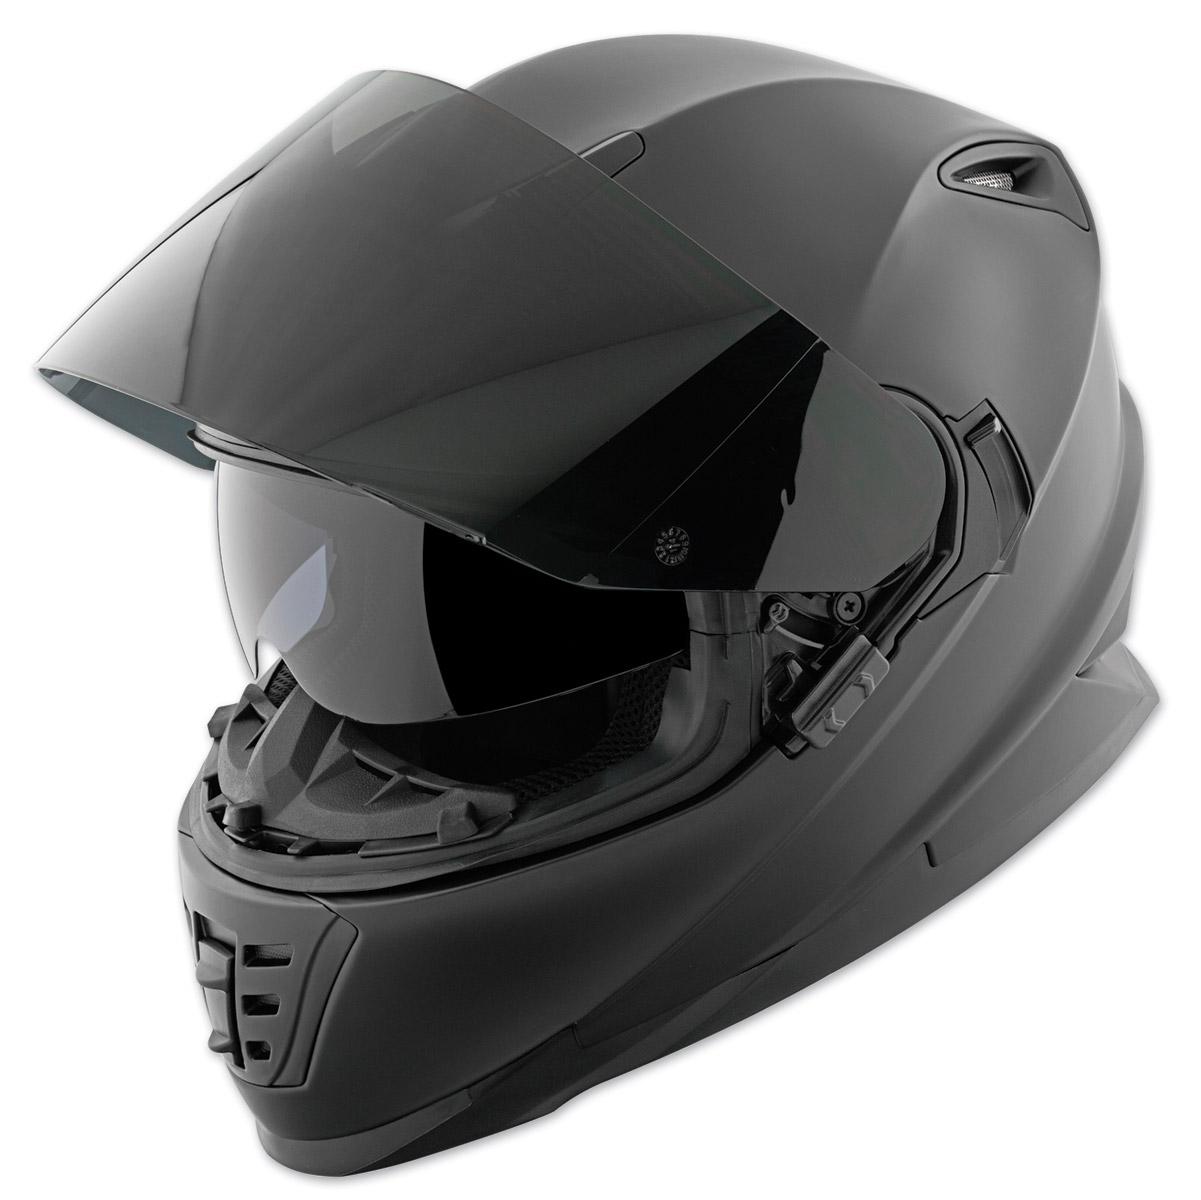 Harley Davidson Iron  Helmet